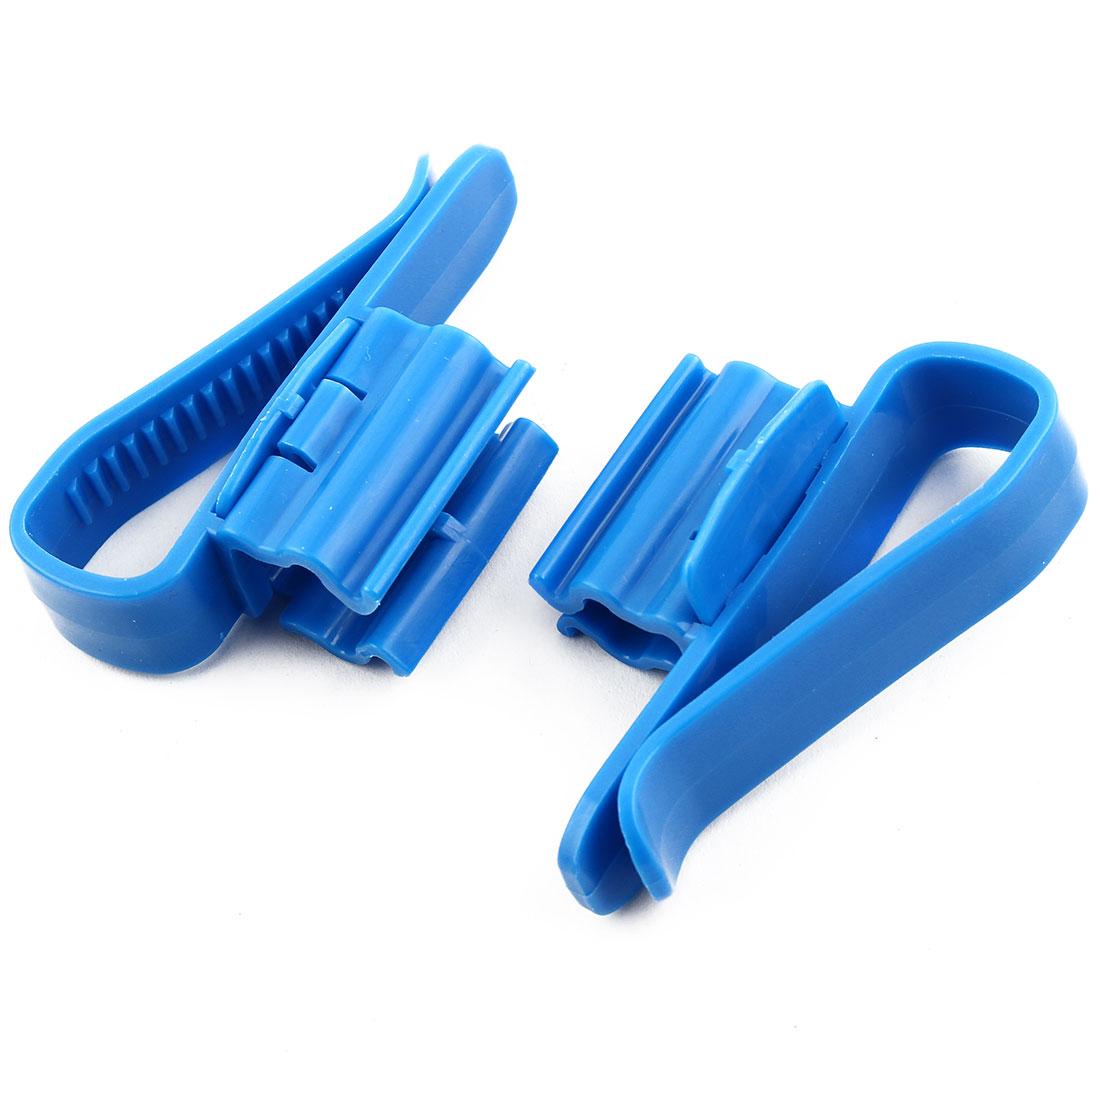 Aquarium Plastic Adjustable Mount Water Hose Pipe Filter Tube Holder Blue 2pcs